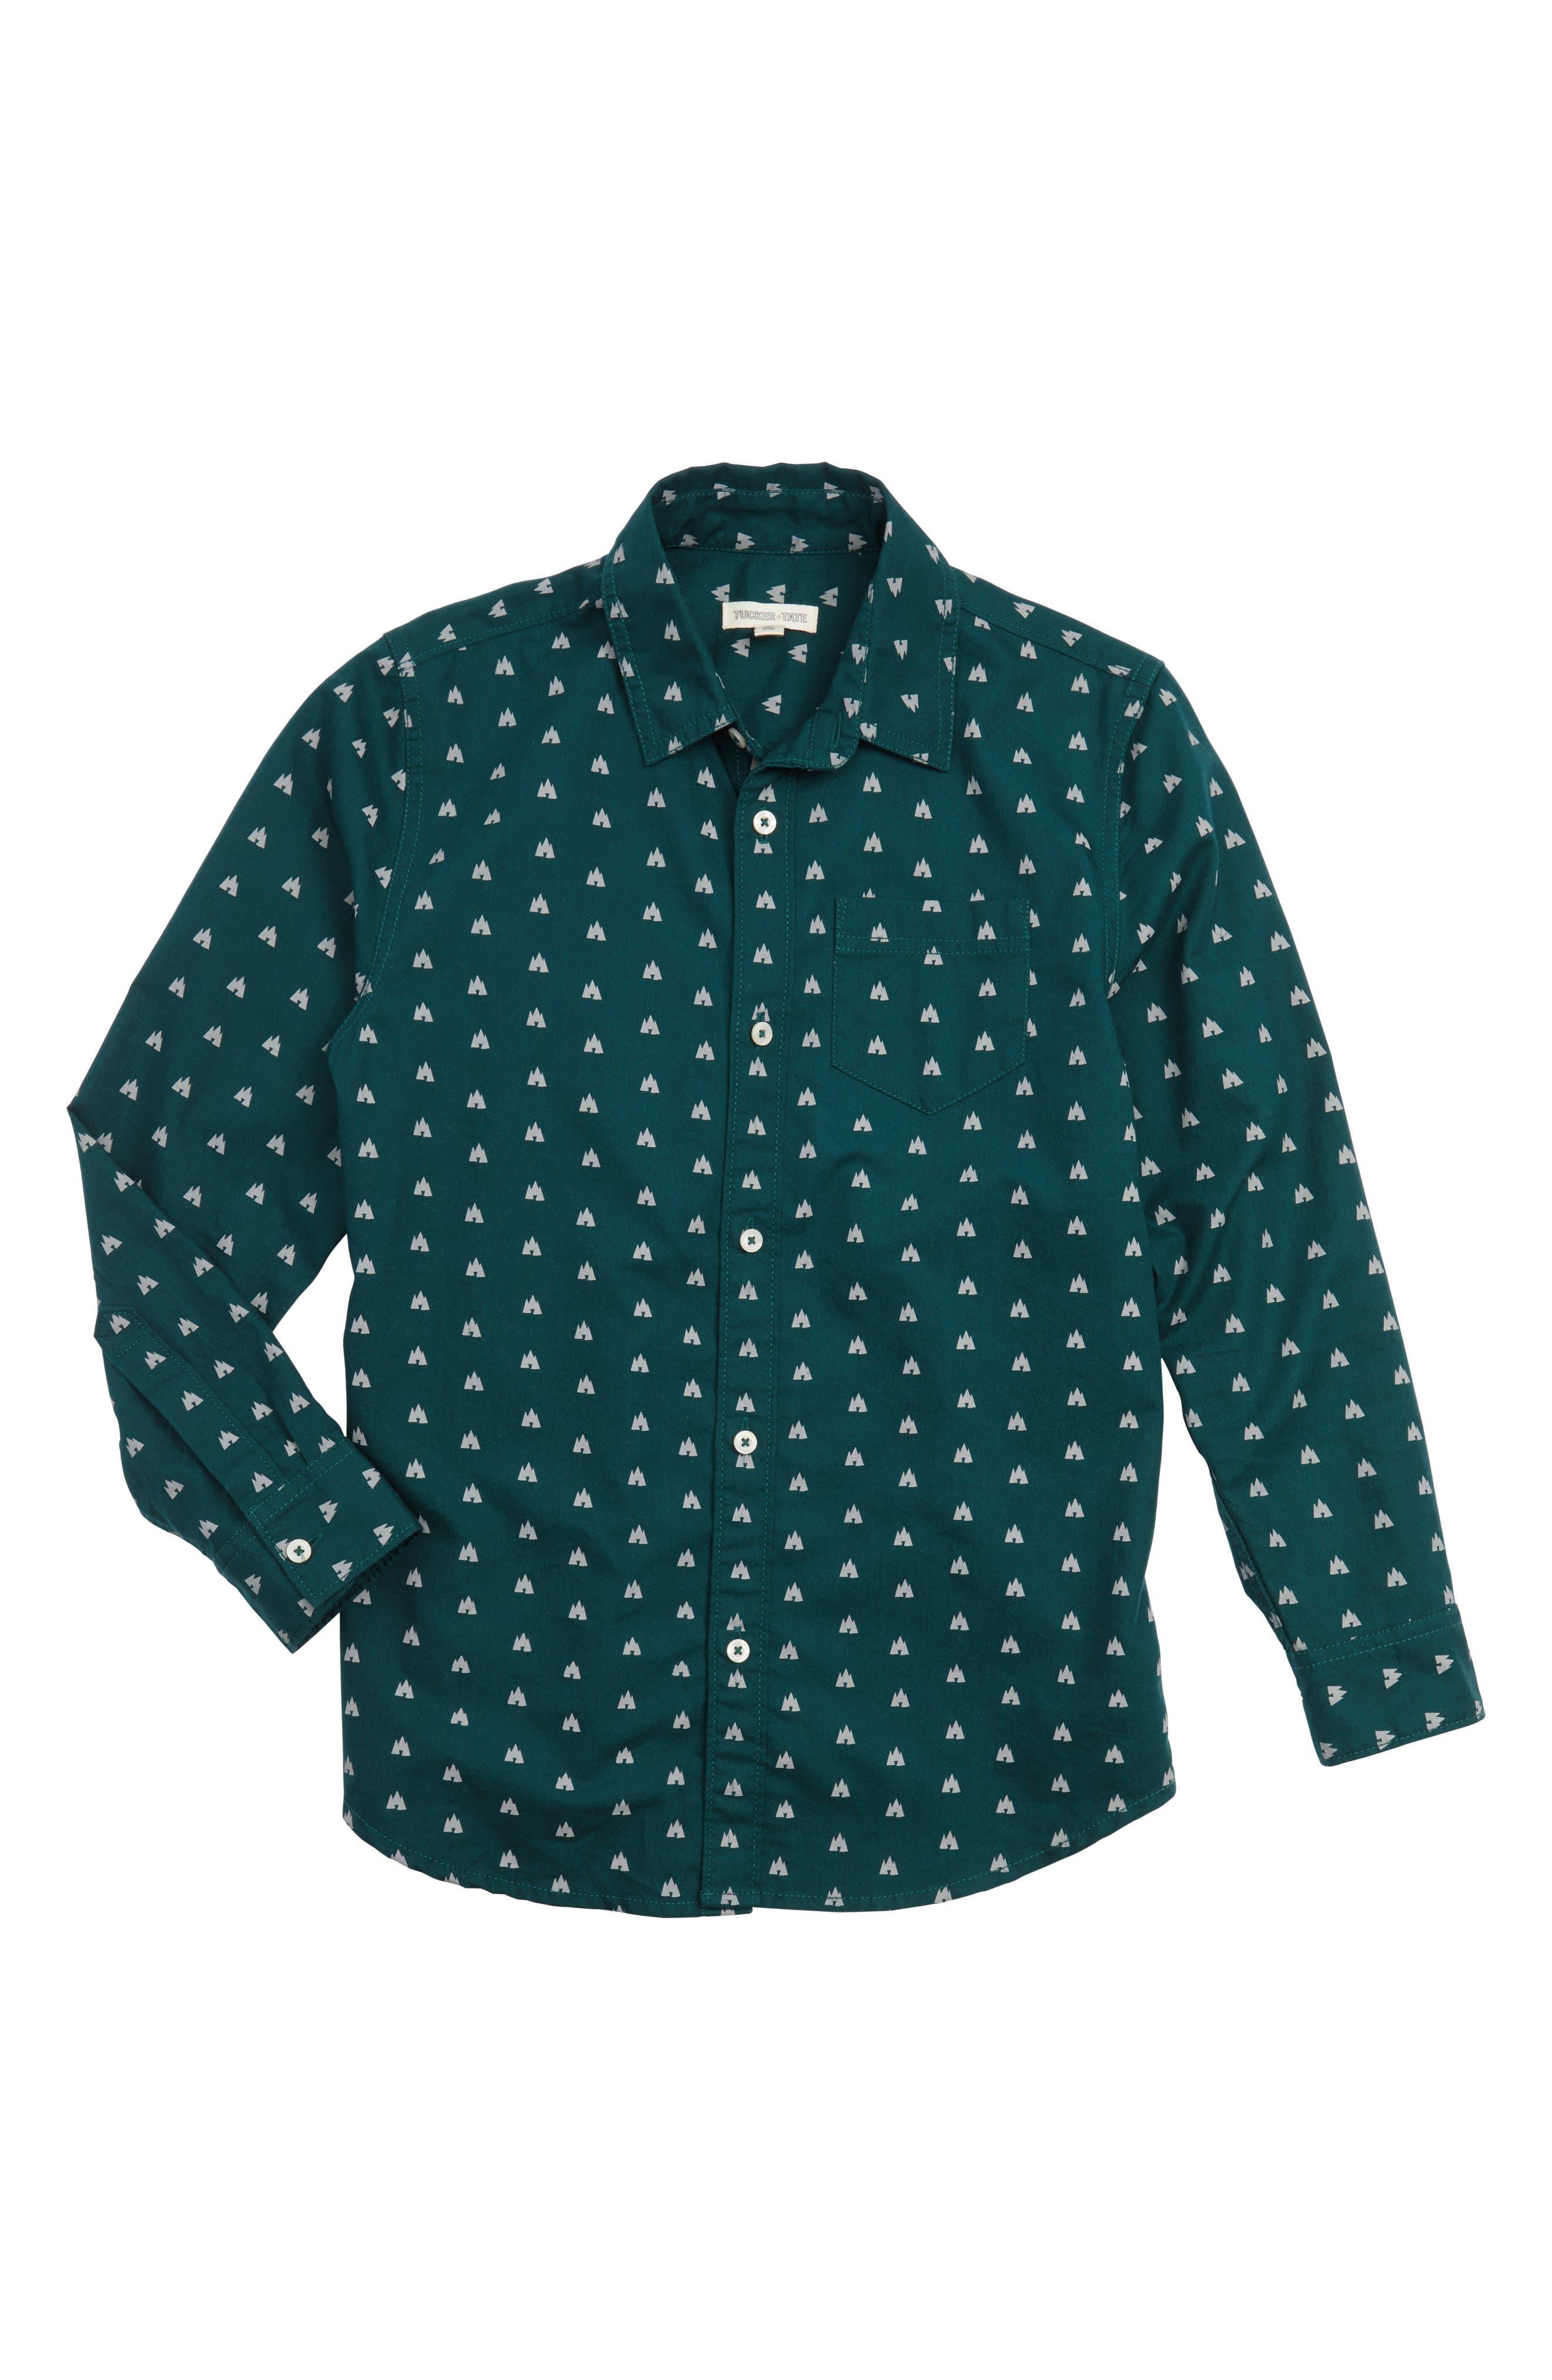 Pine Tree Sport Shirt,                             Main thumbnail 1, color,                             301